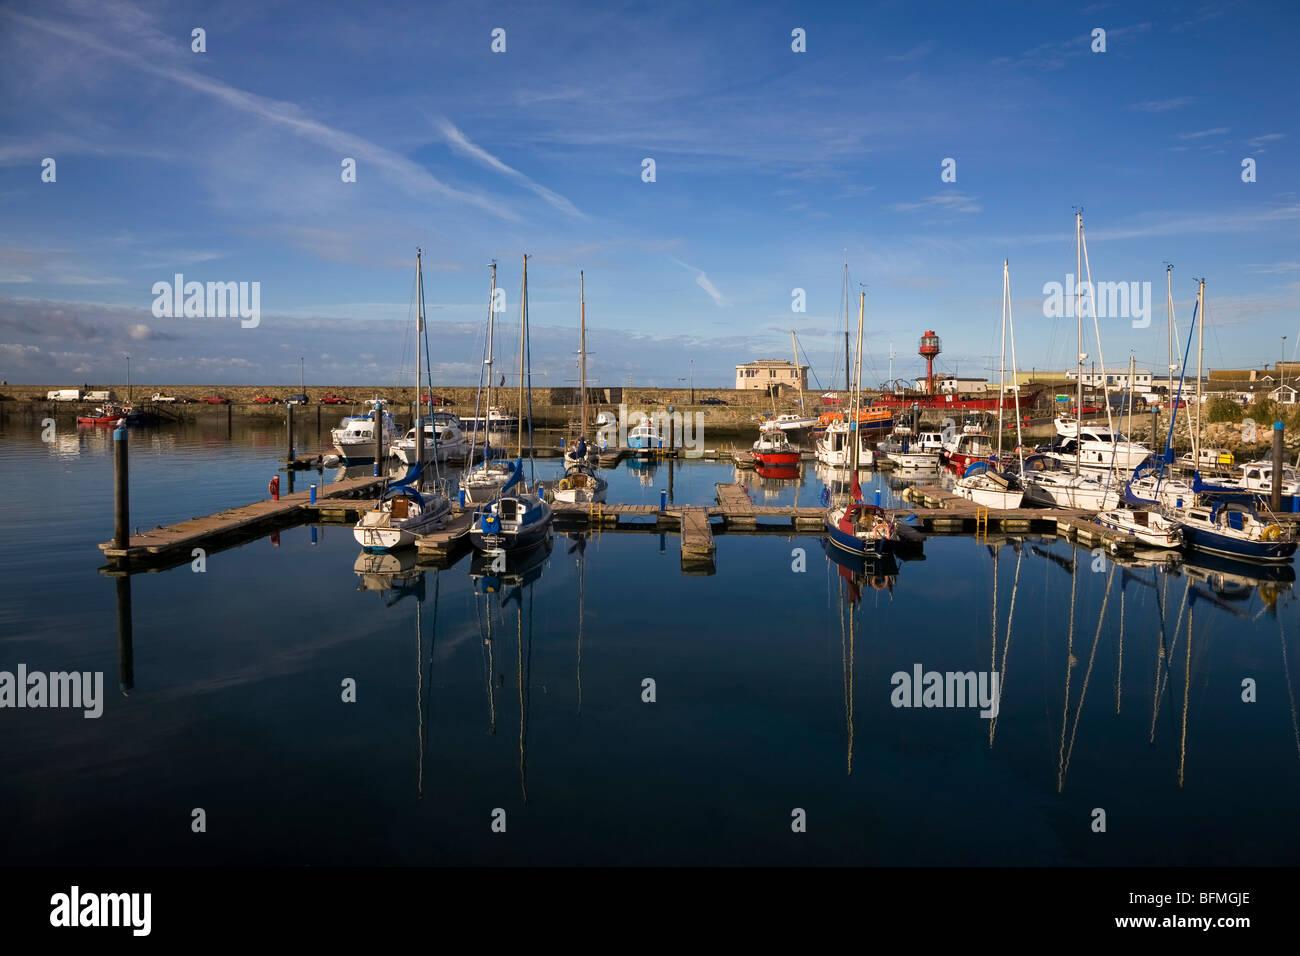 Yachts and Small Craft Marina, Kilmore Quay, County Wexford, Ireland - Stock Image